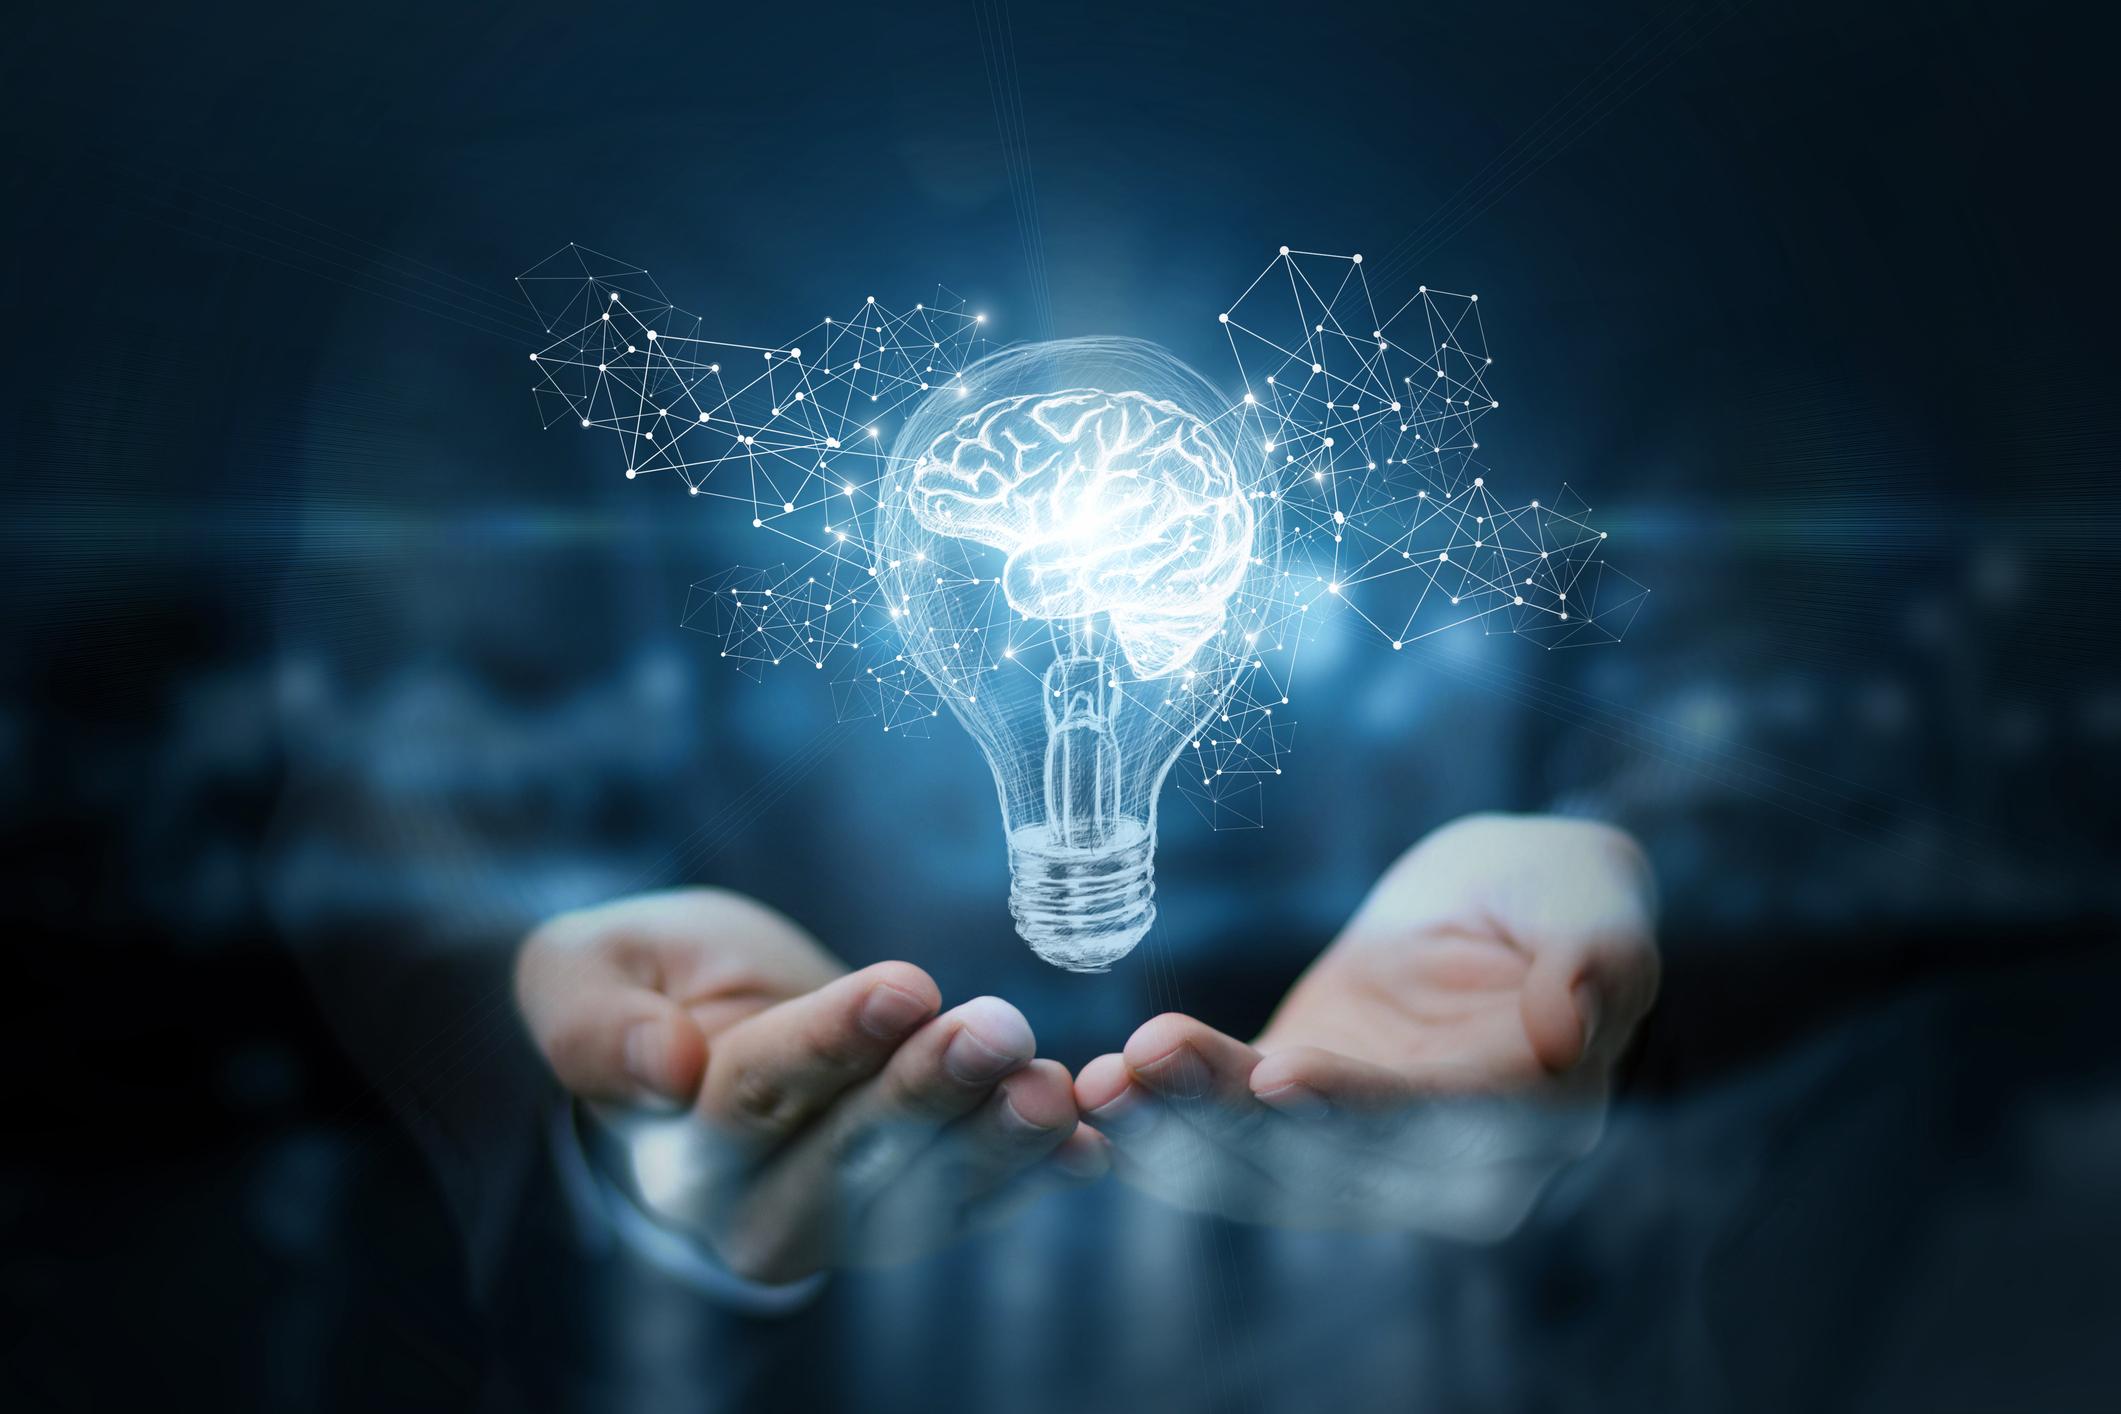 hands presenting illustration of light bulb with brain inside